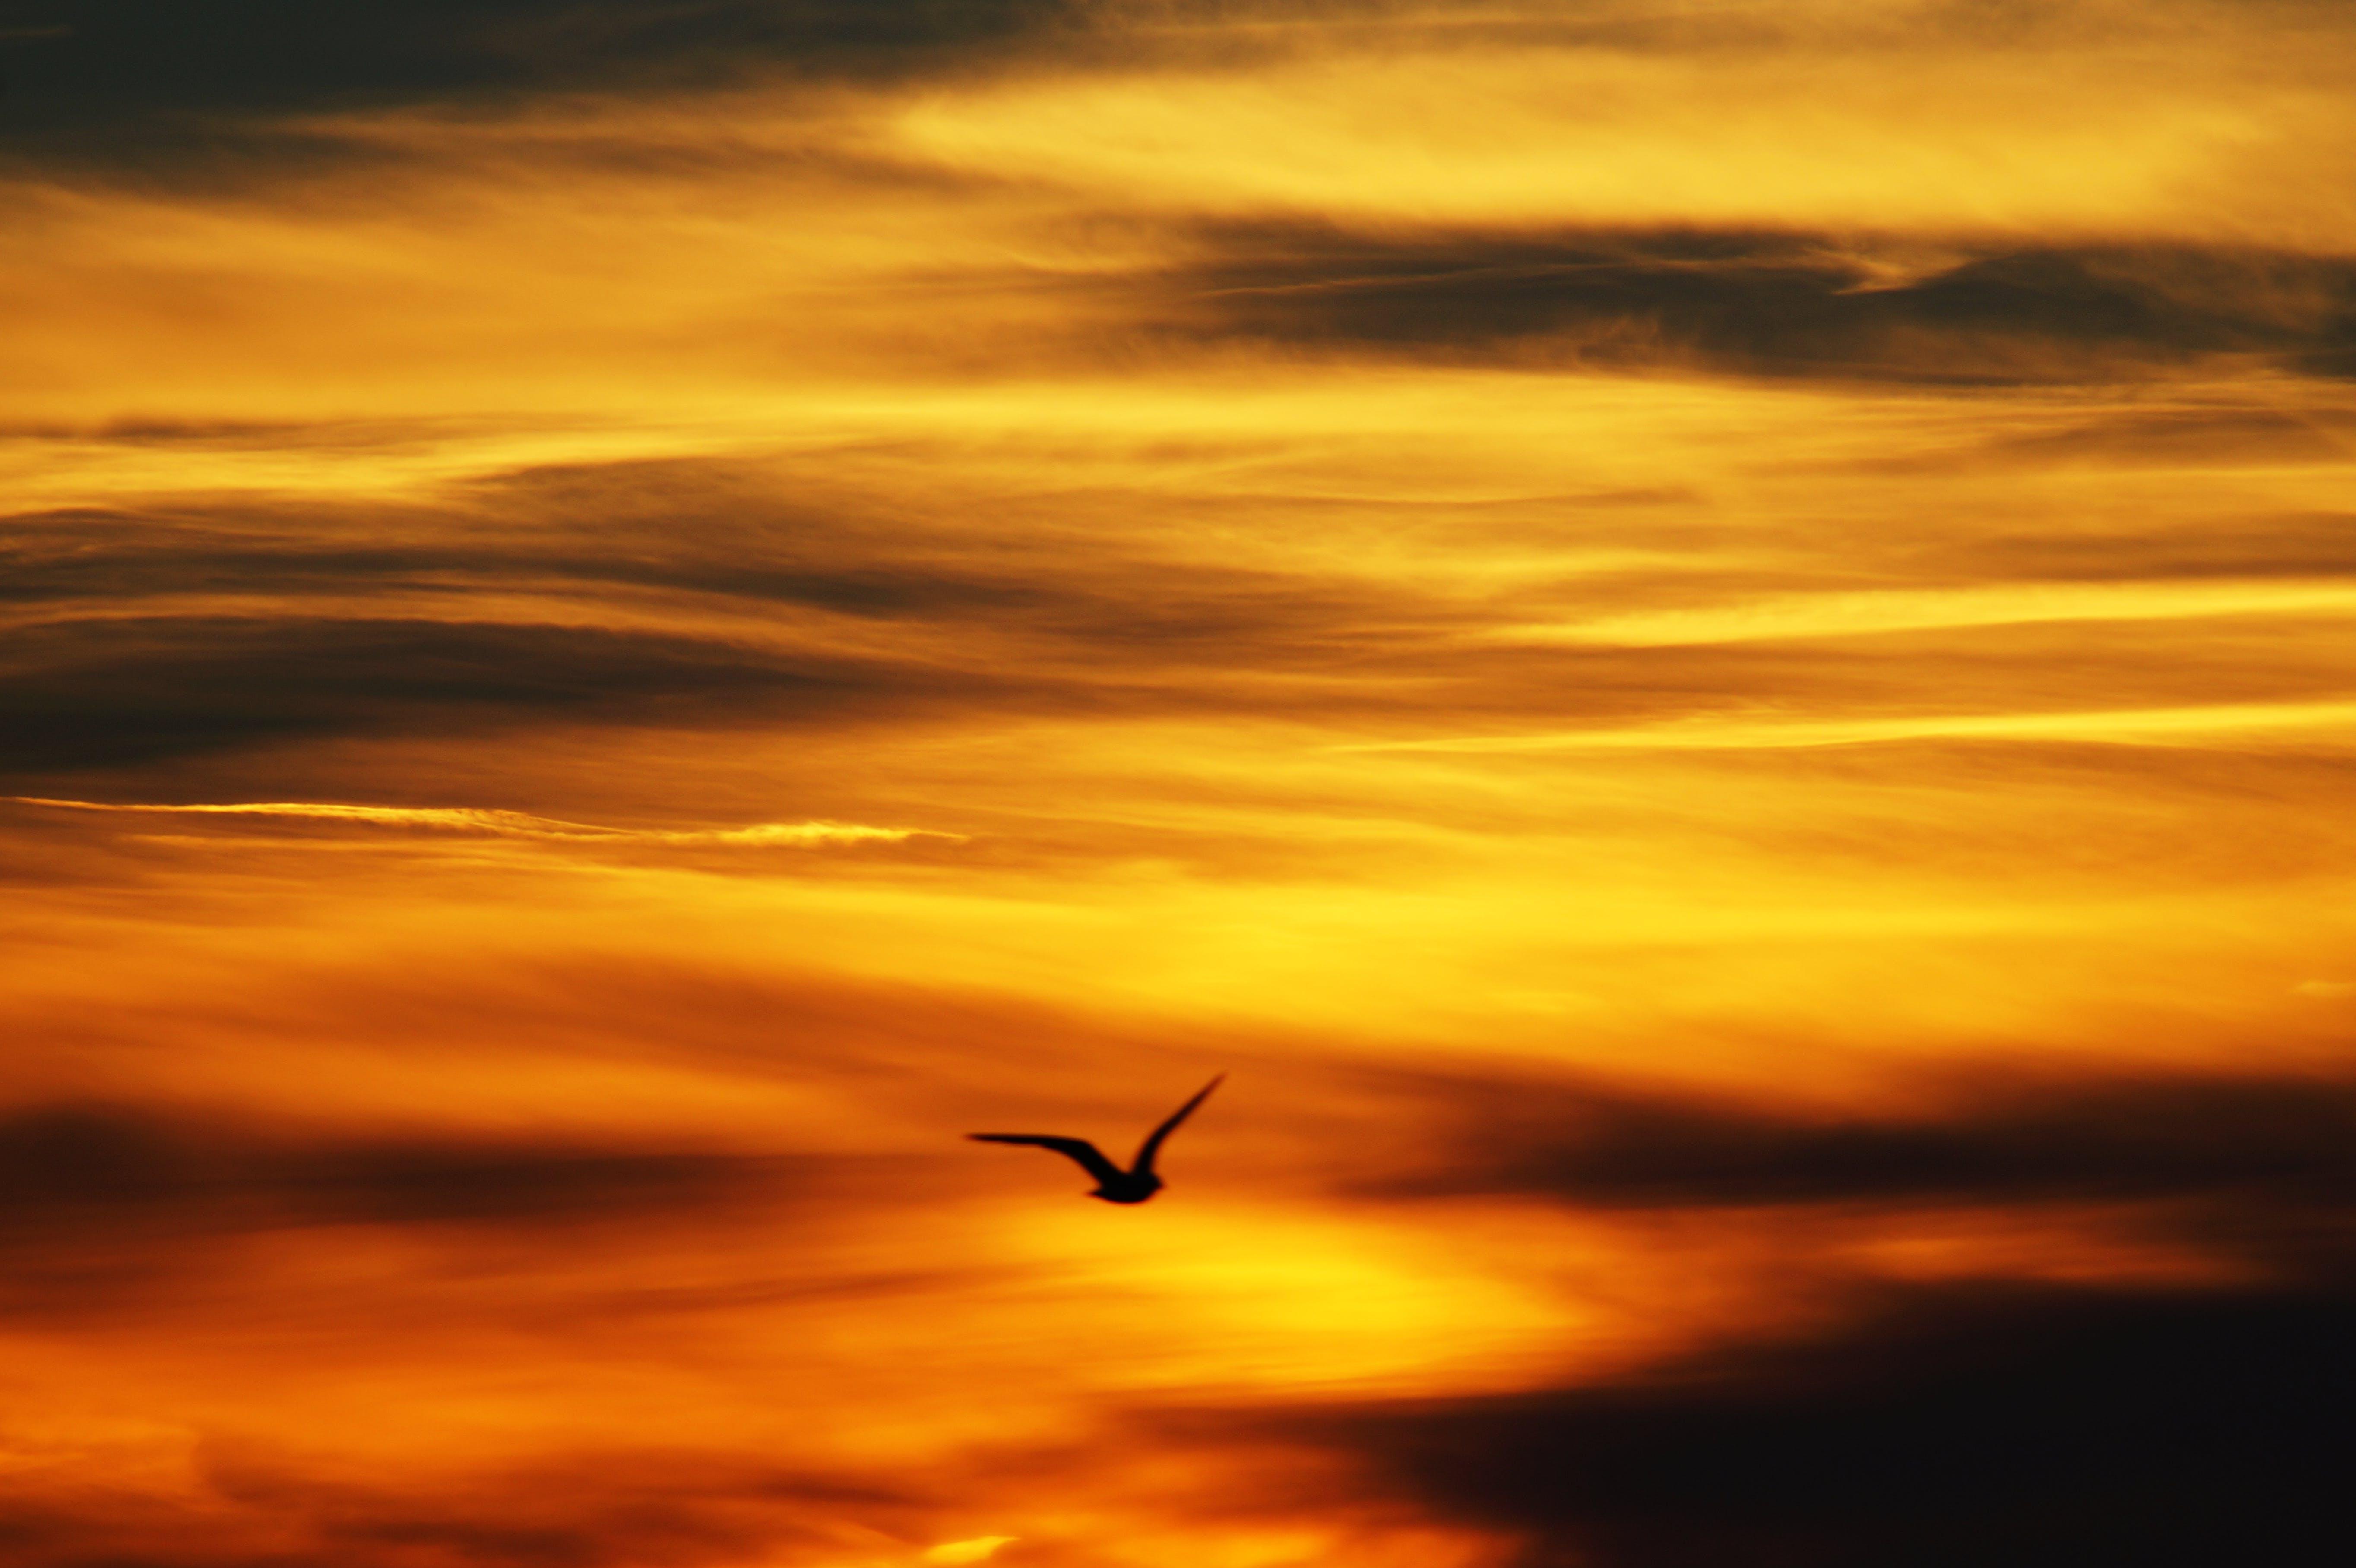 Black Bird Flying Under Yellow Sky